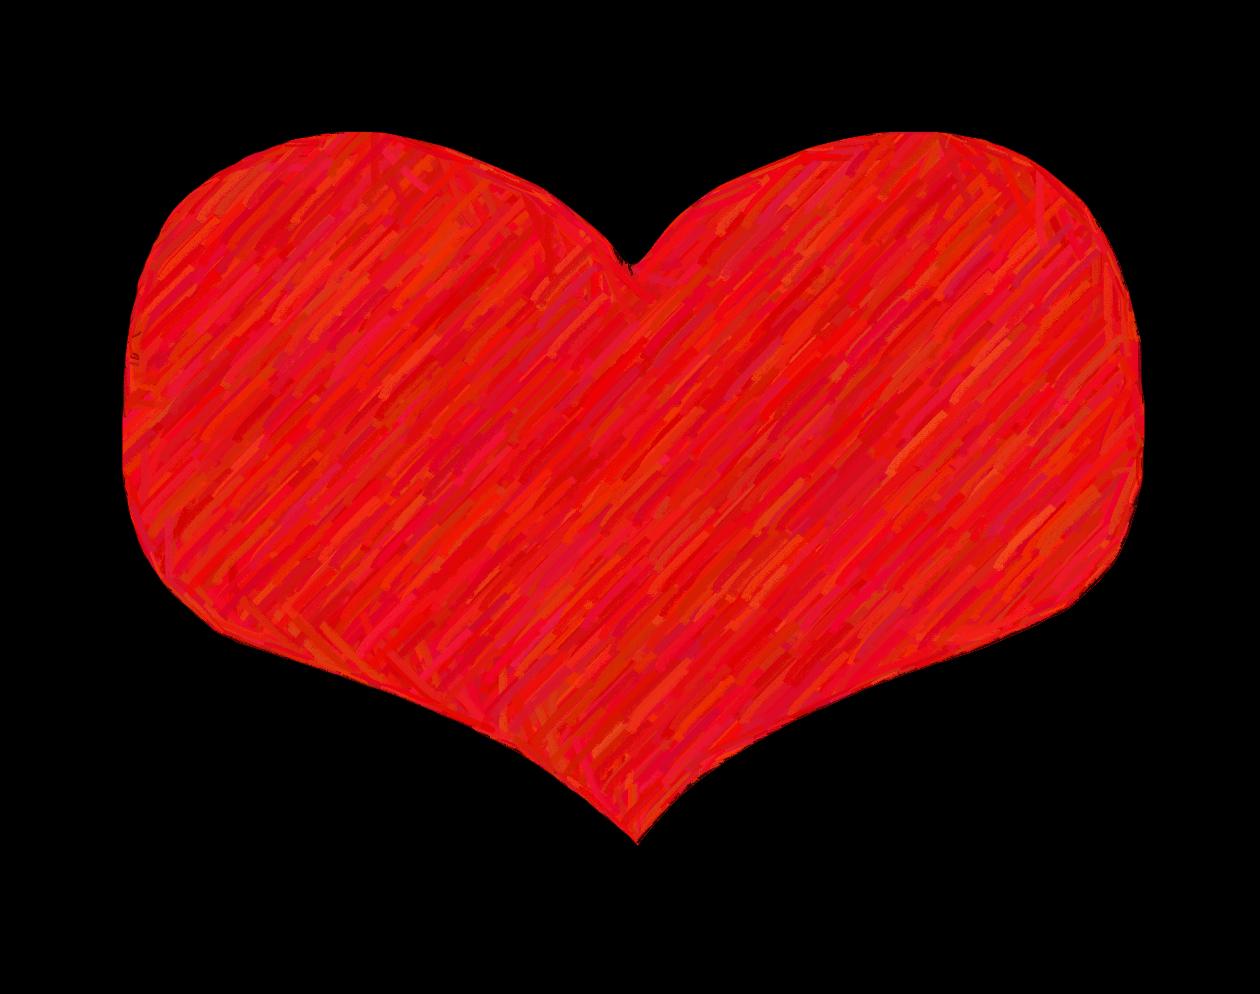 Hearts clip art images image 2-Hearts clip art images image 2-12